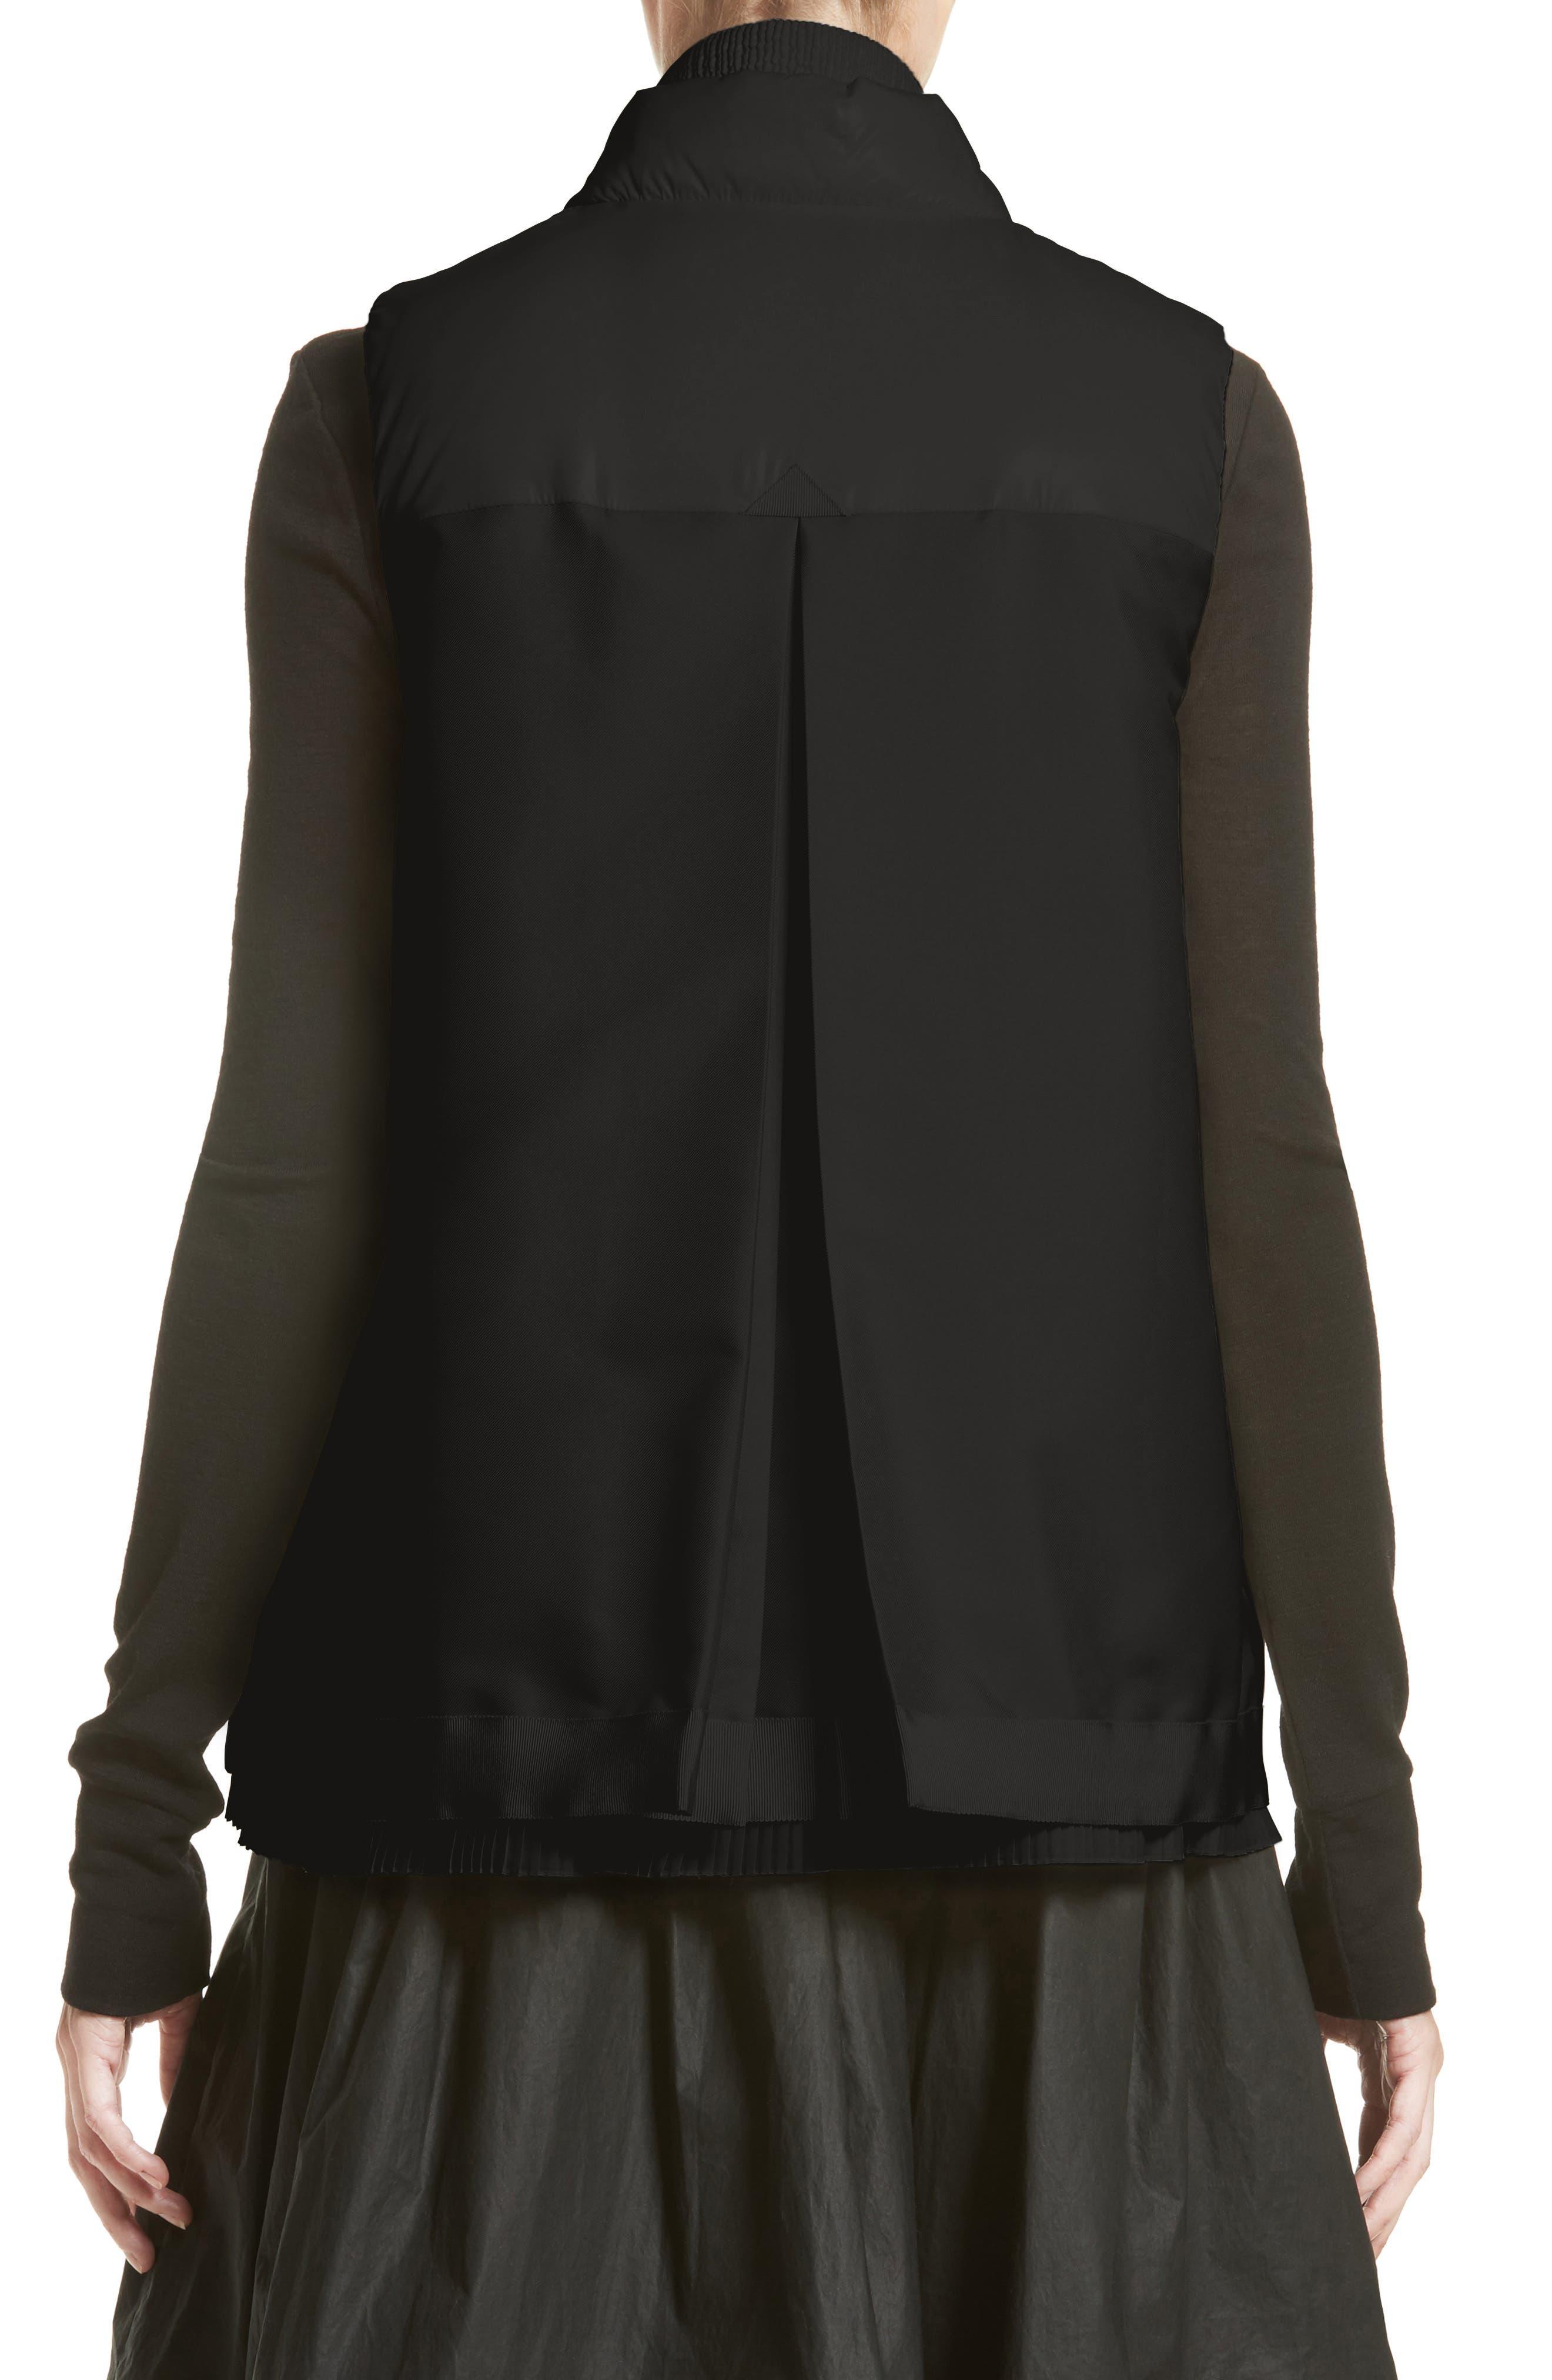 Jane Mixed Media Down Puffer Vest,                             Alternate thumbnail 2, color,                             001